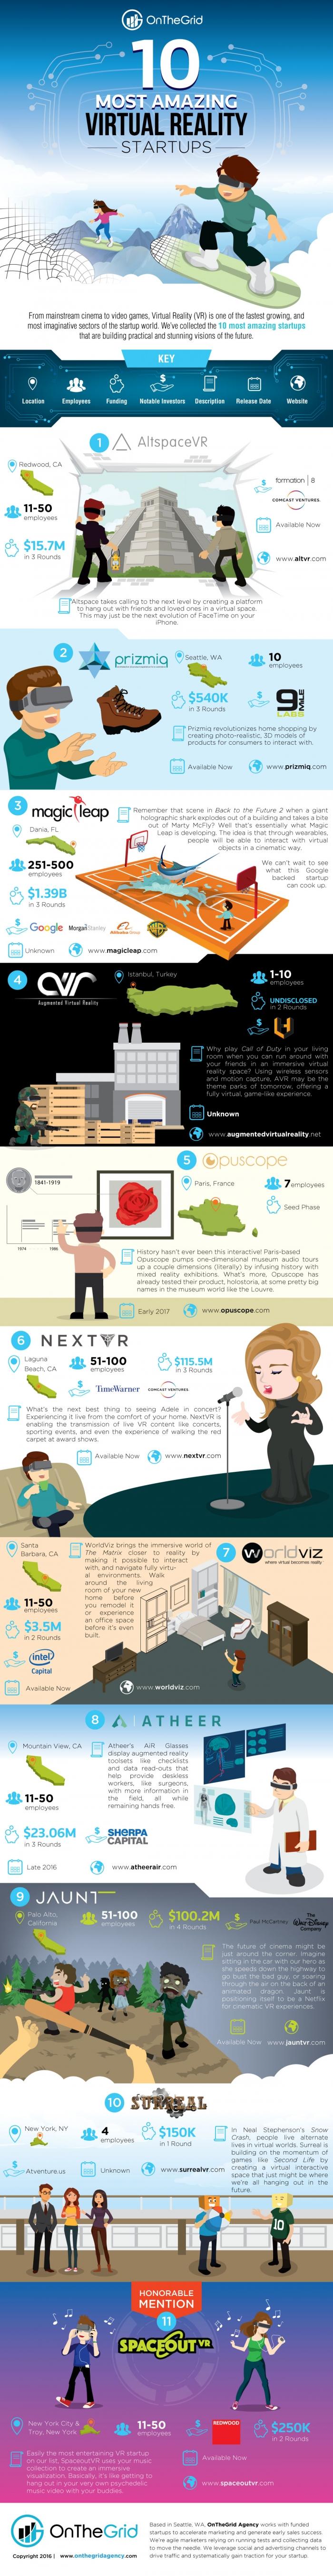 Ten Most Amazing Virtual Reality Startups! Infographics